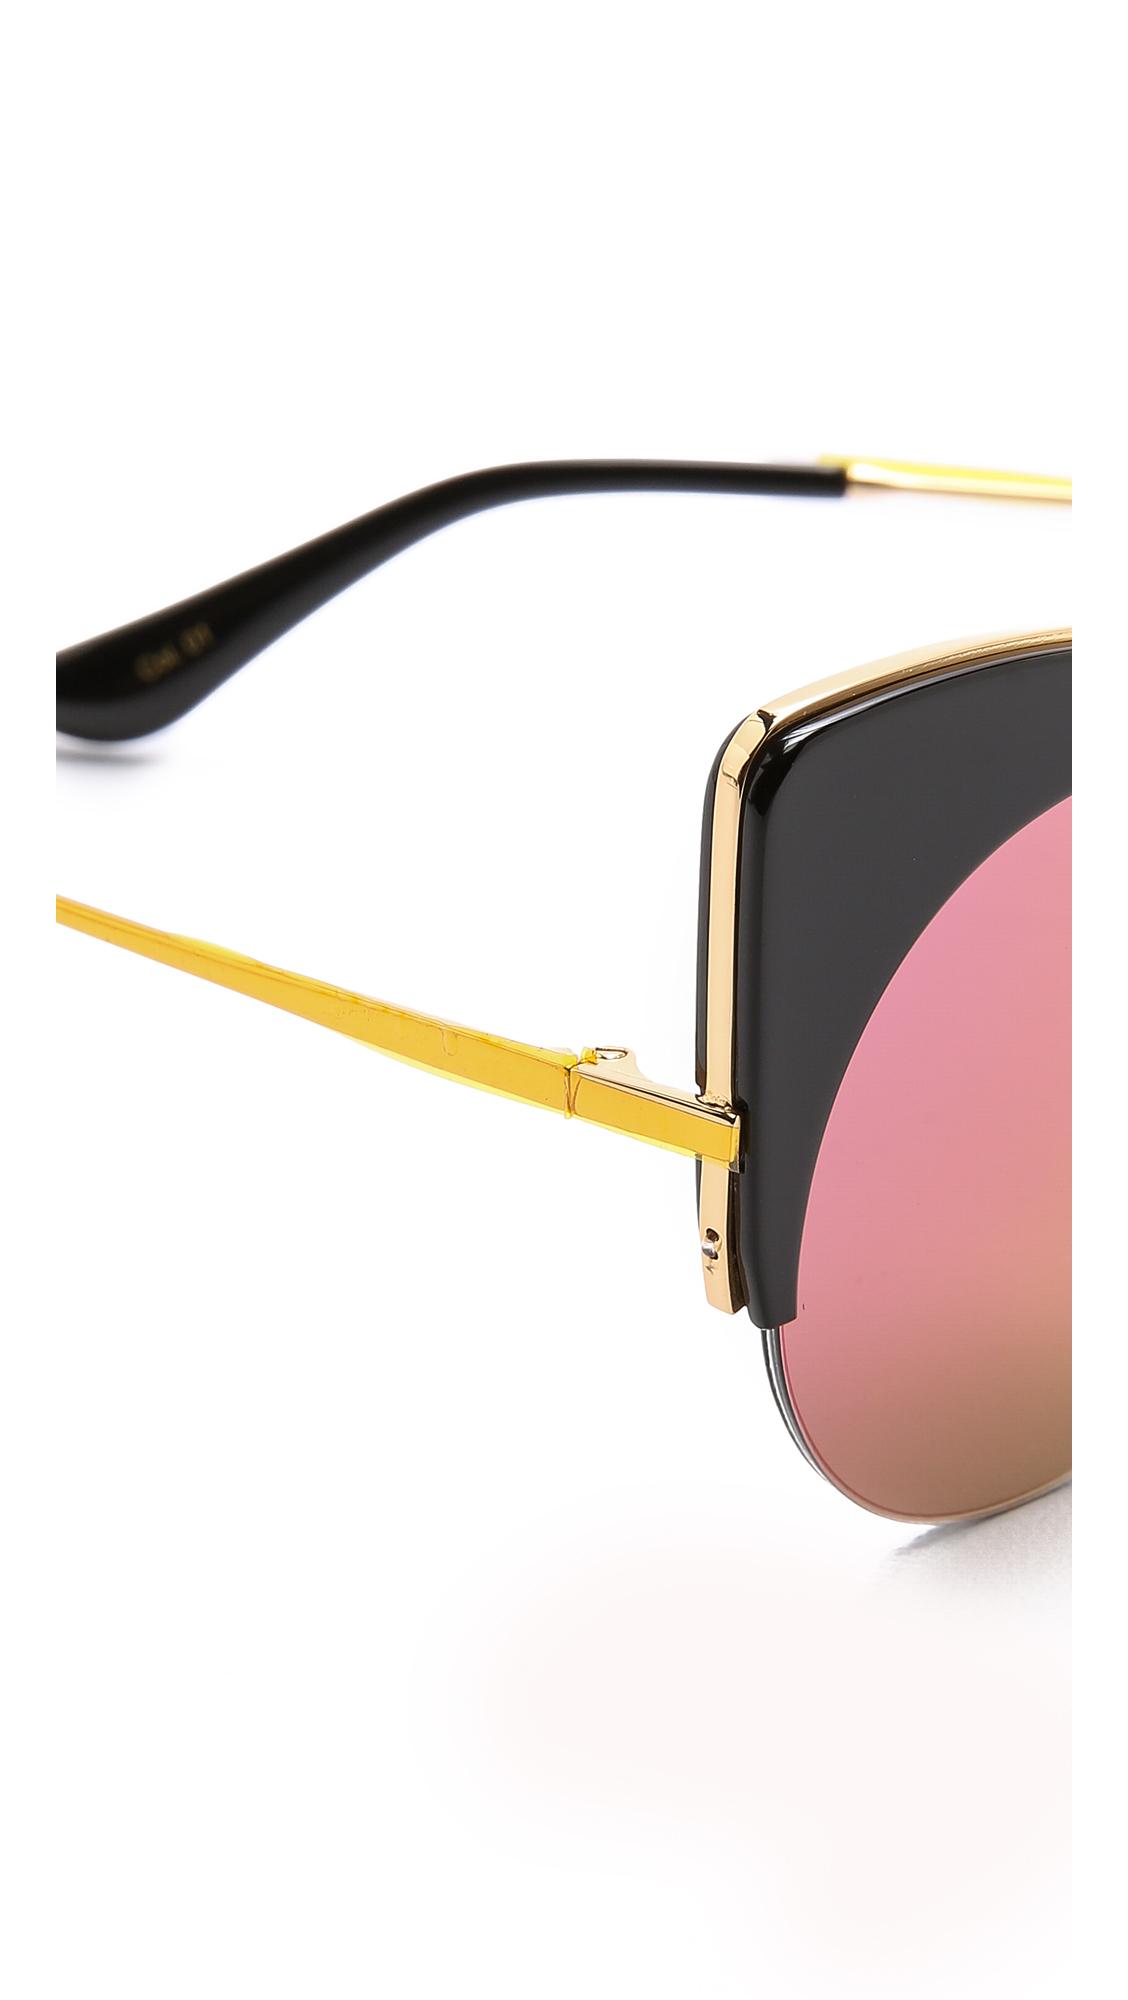 ffdef737991d Gentle Monster Alley Cat Sunglasses - Black pink in Black - Lyst